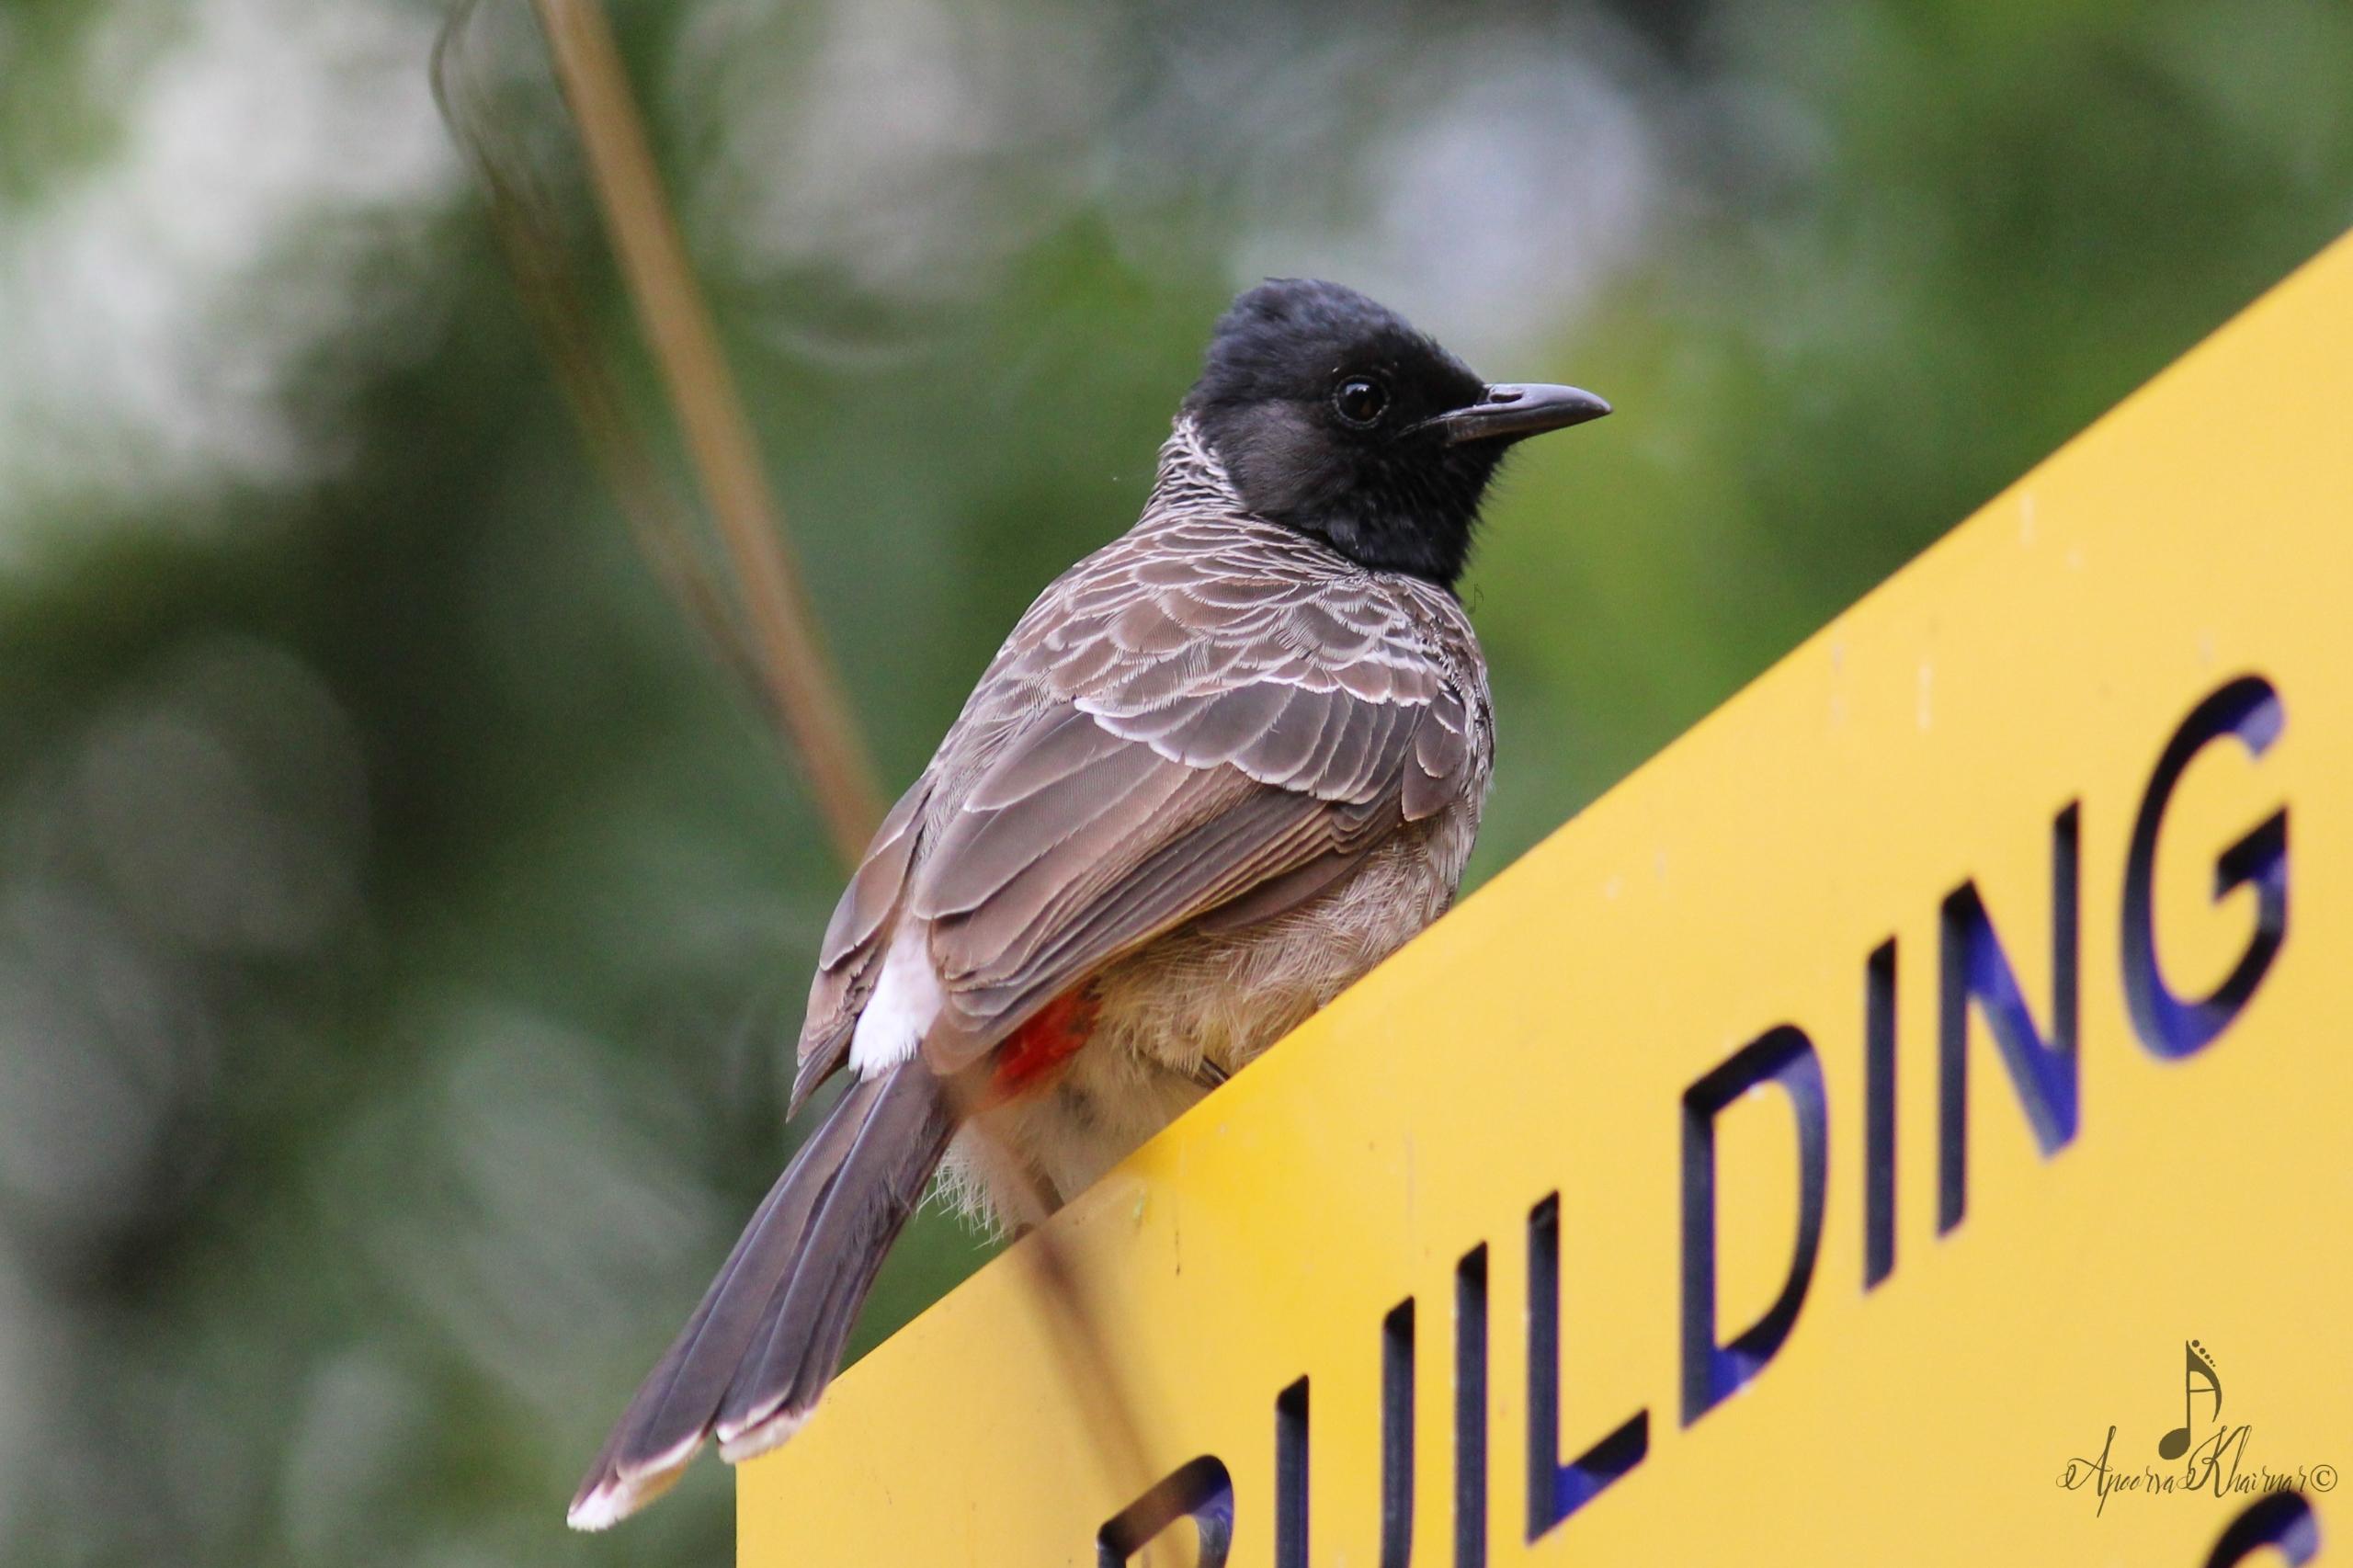 Window birding 5: Red vented bu - apps11 | ello